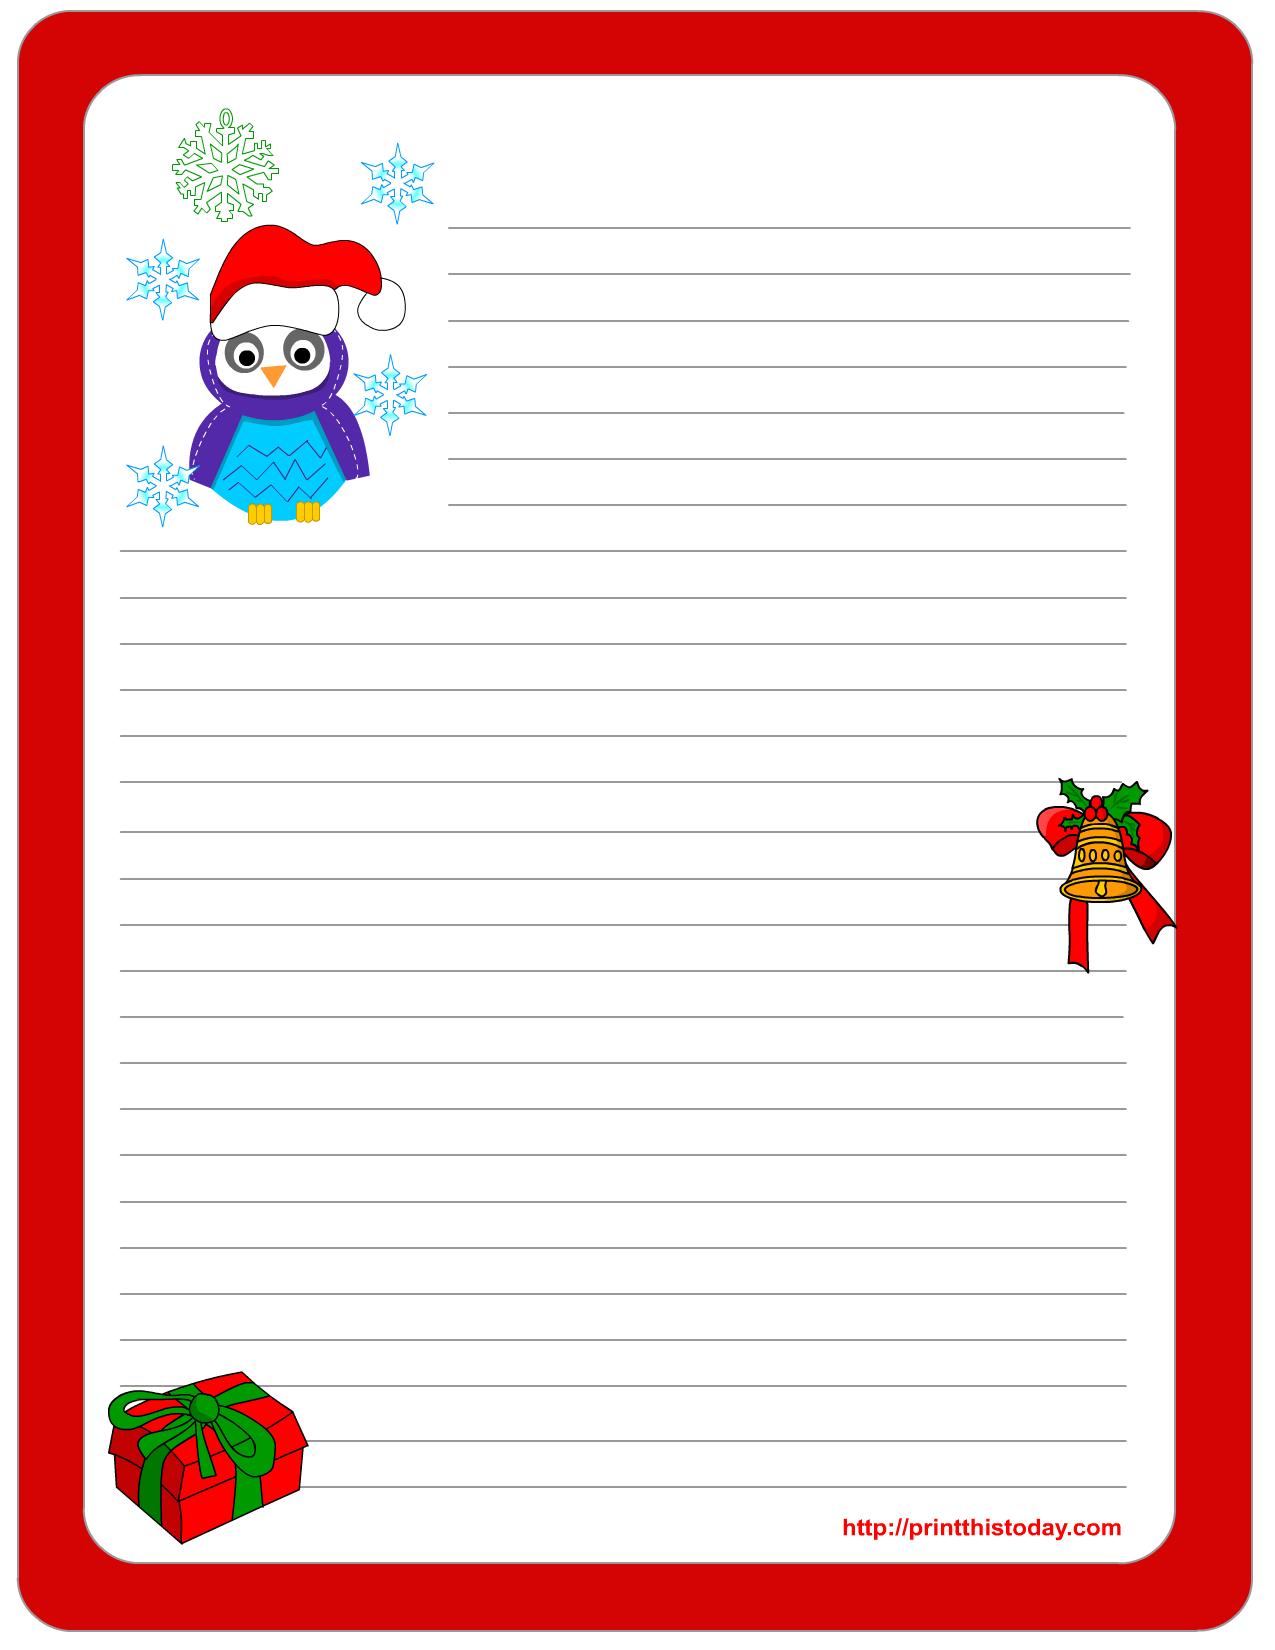 Doc8591100 Christmas Wish List Template Free Printable Letter – Christmas Wish List Paper